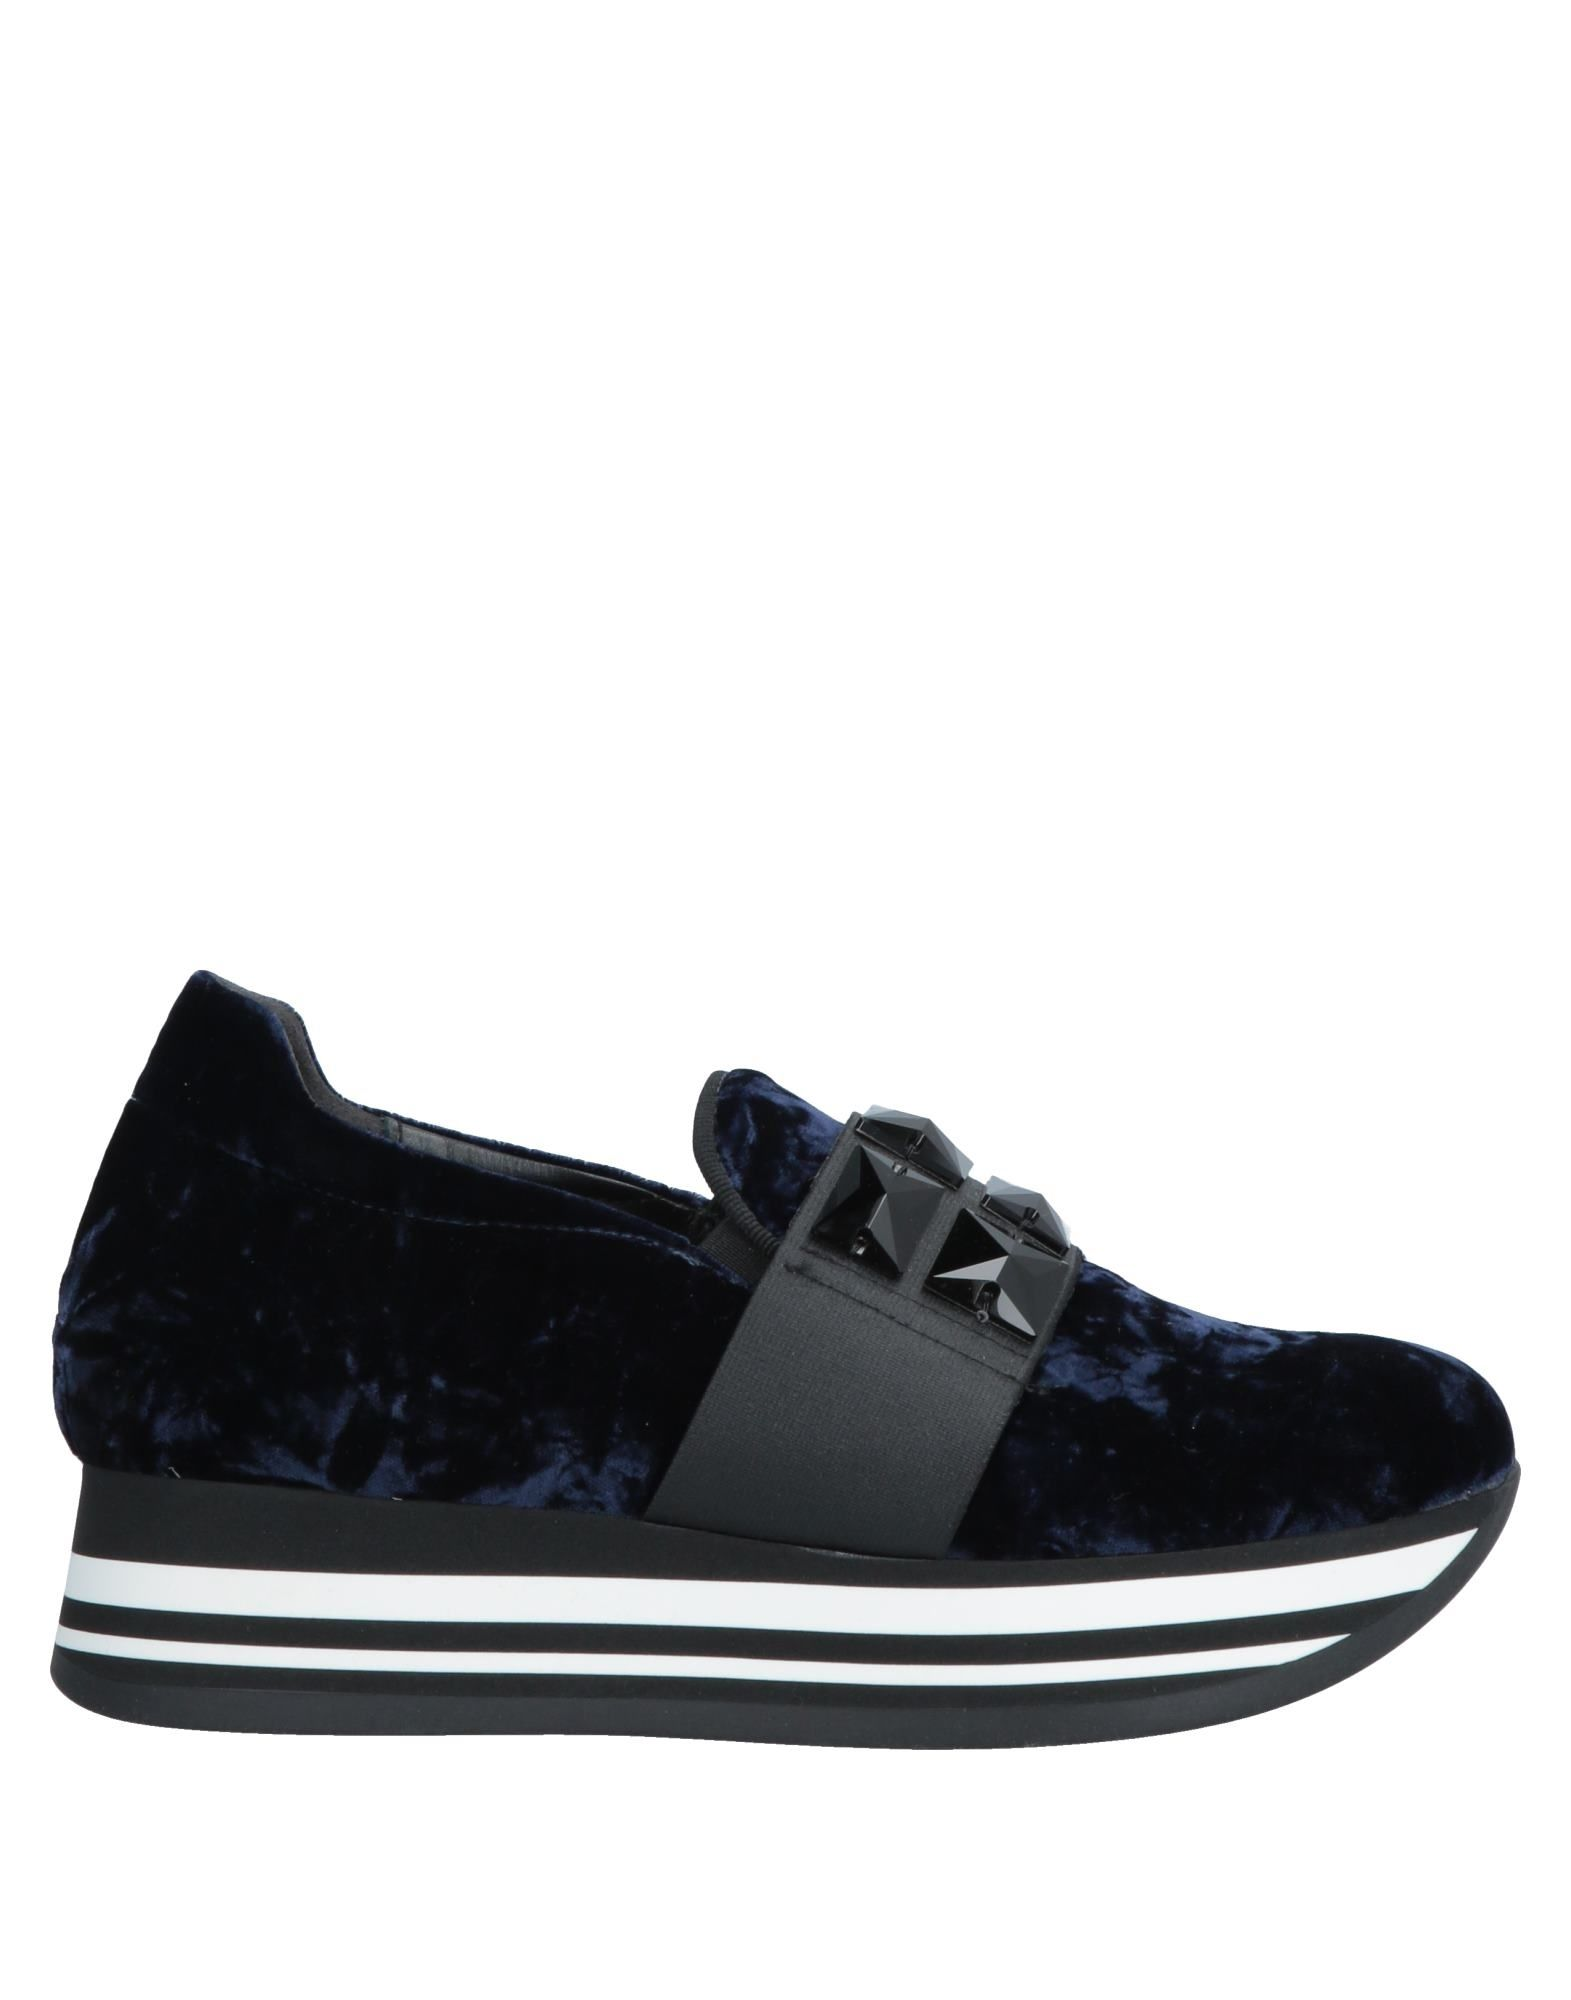 JEANNOT Низкие кеды и кроссовки jeannot низкие кеды и кроссовки